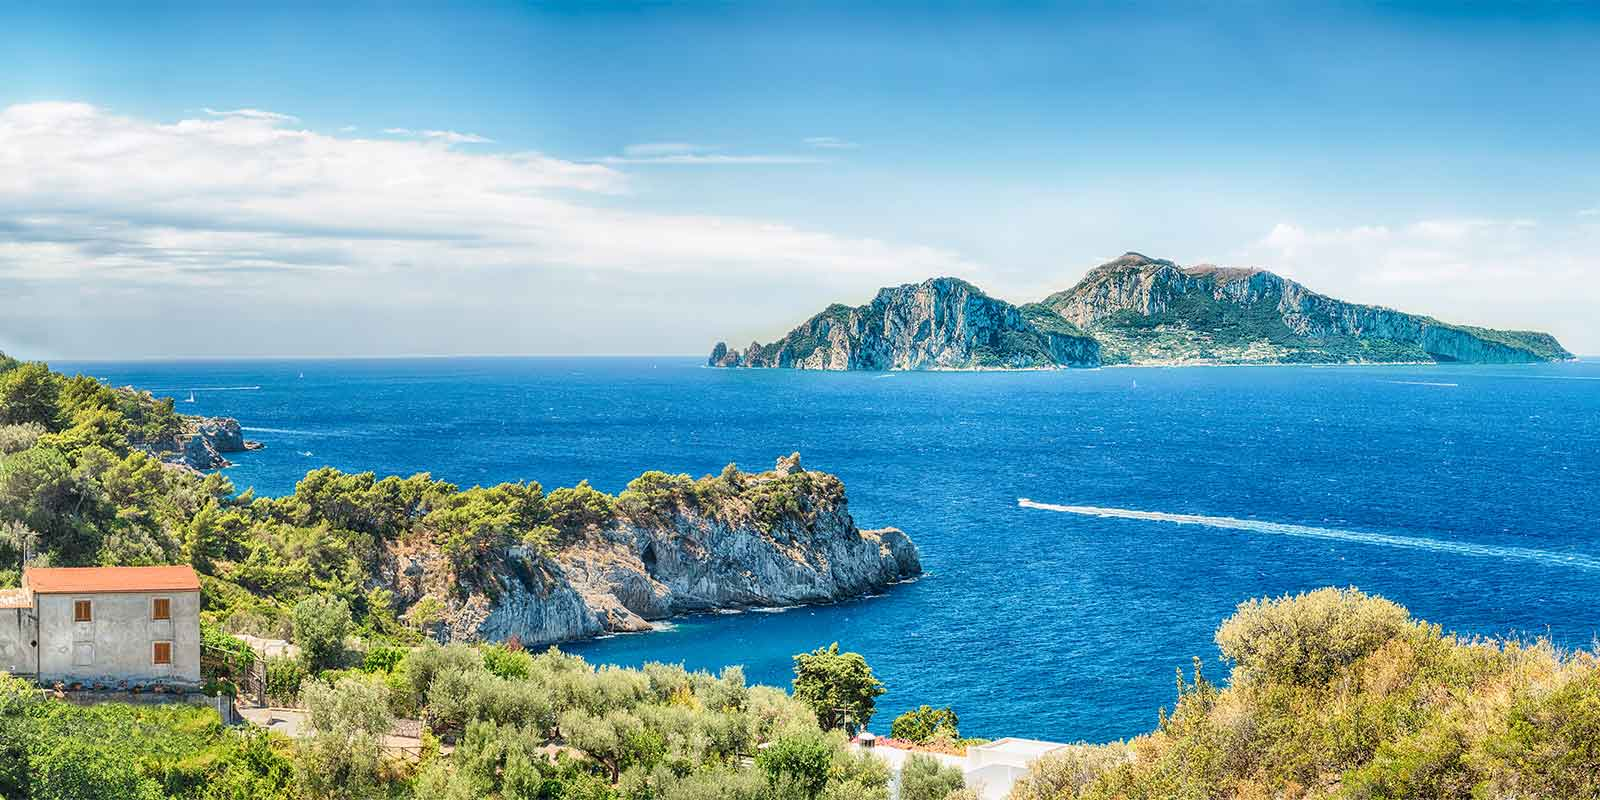 View of Capri from Massa Lubrense in Italy